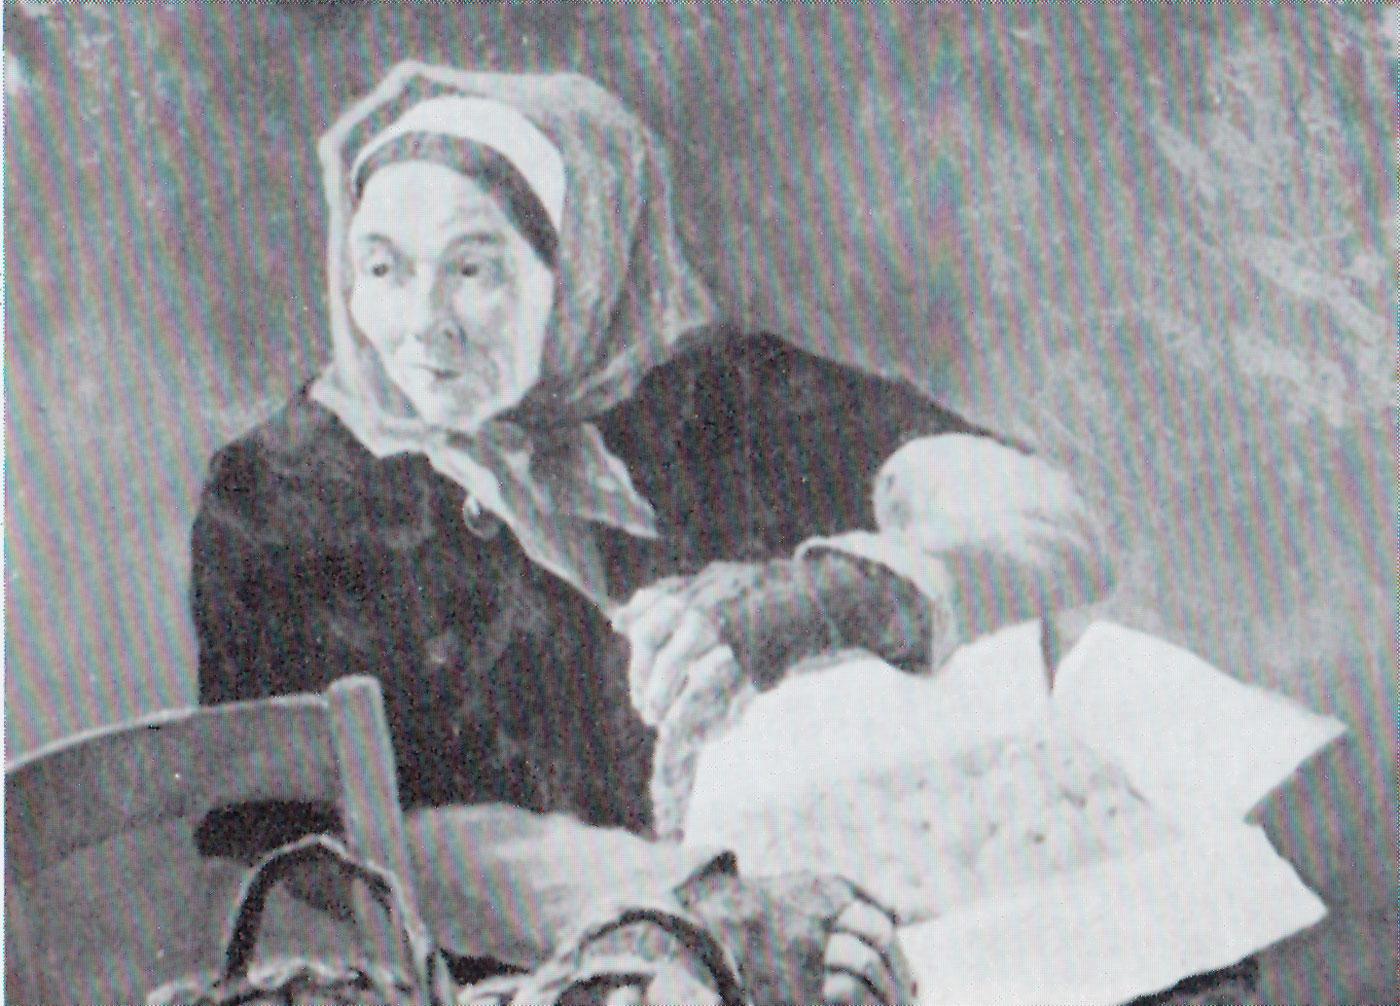 El Pintor Irun S Vicente Berrueta Iturralde 1873 1908 Fco  # Muebles Paquita Santa Cruz De La Zarza